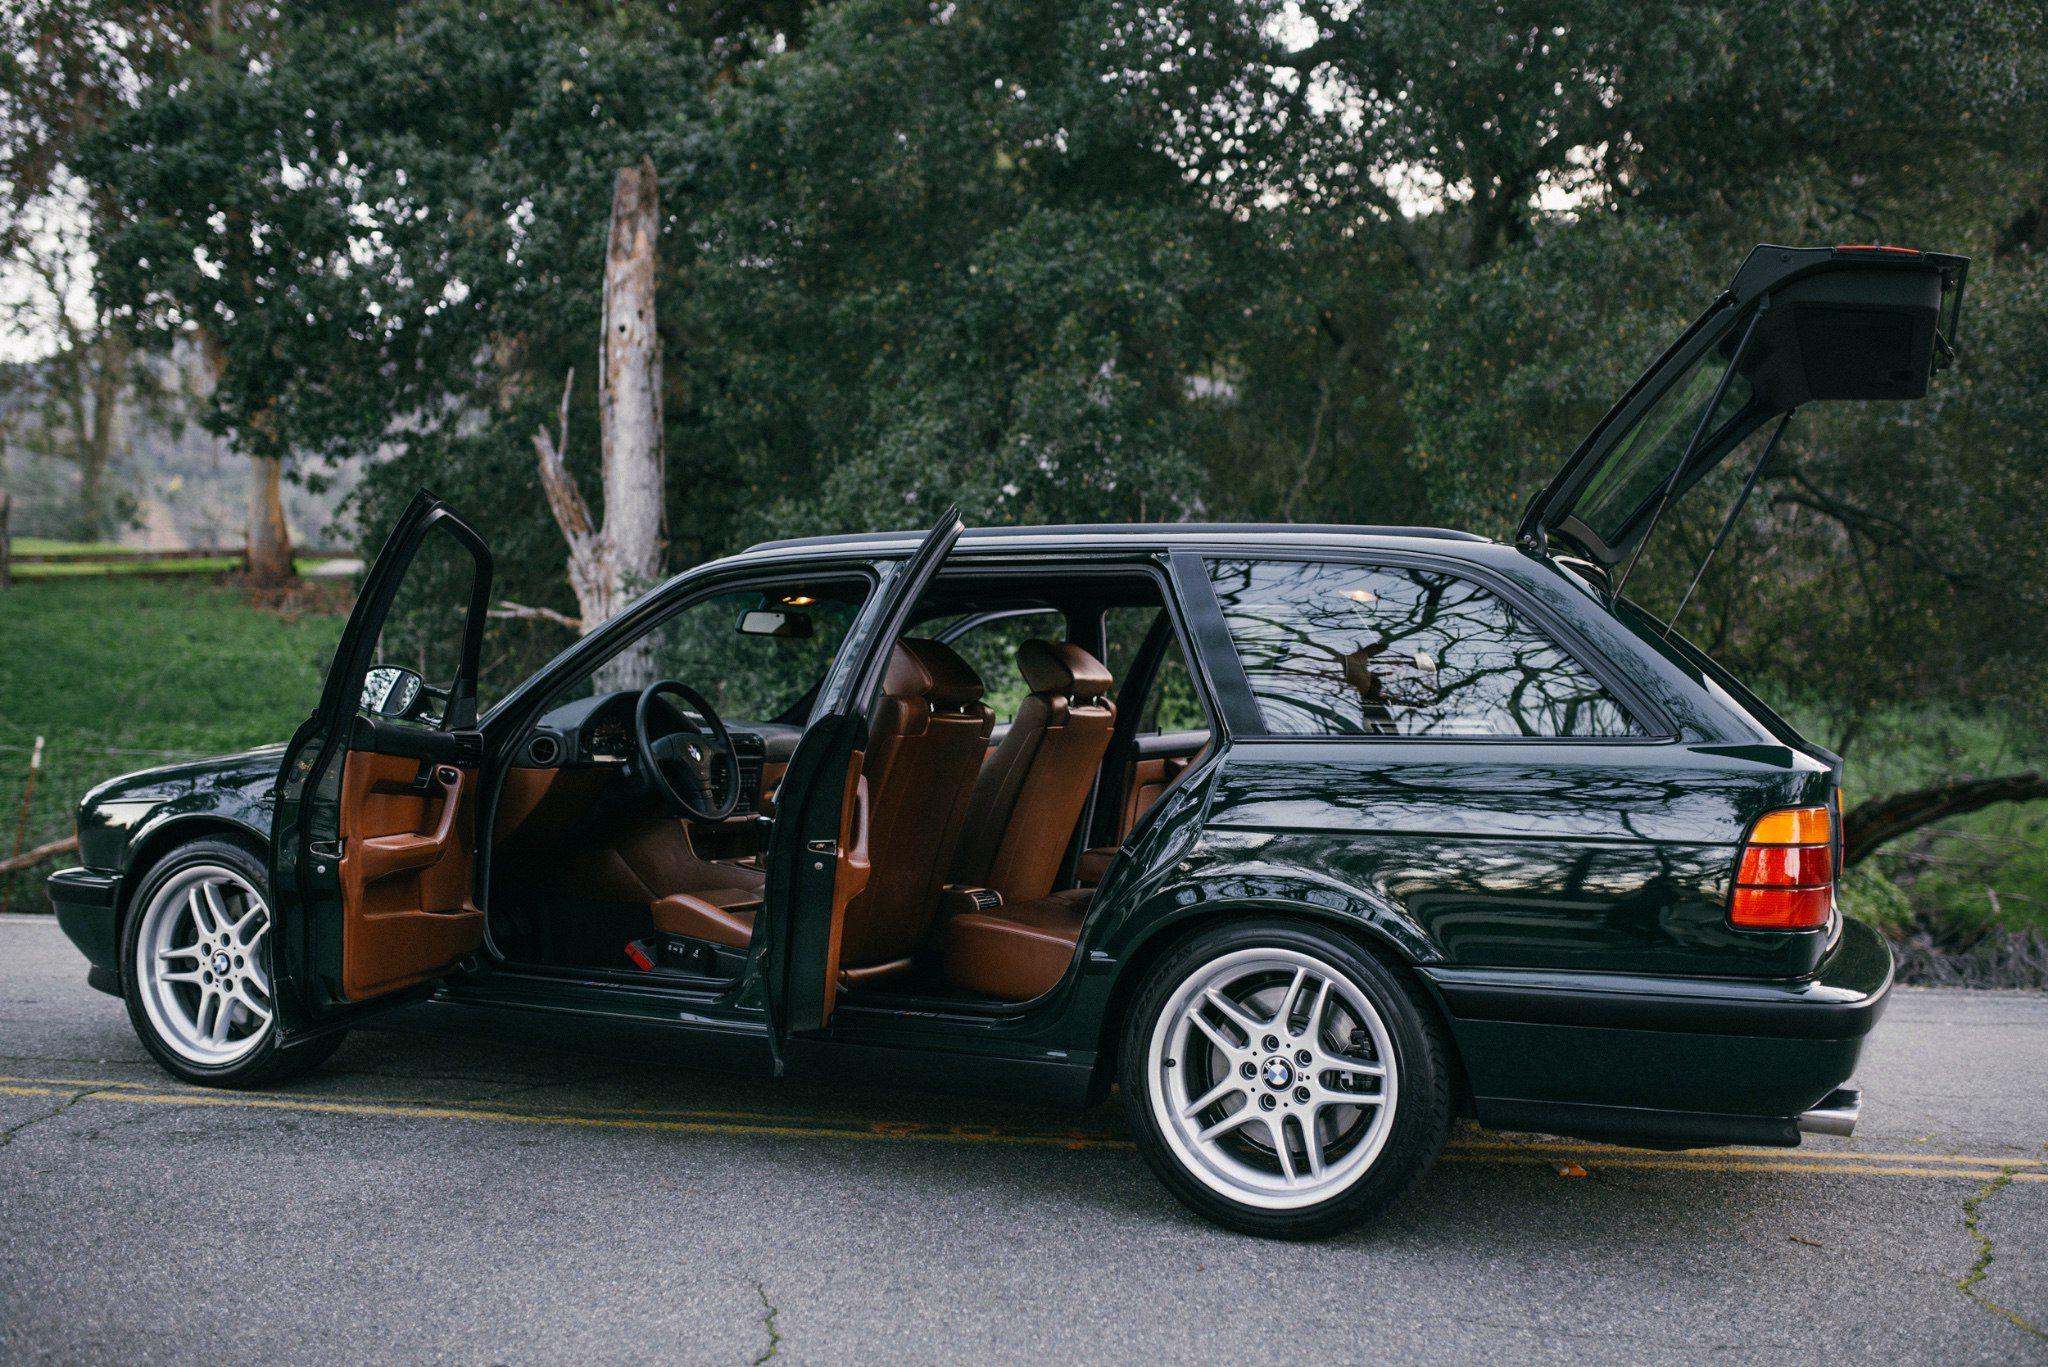 5 Series E34 Touring Bmw Touring Bmw M5 Touring Bmw E34